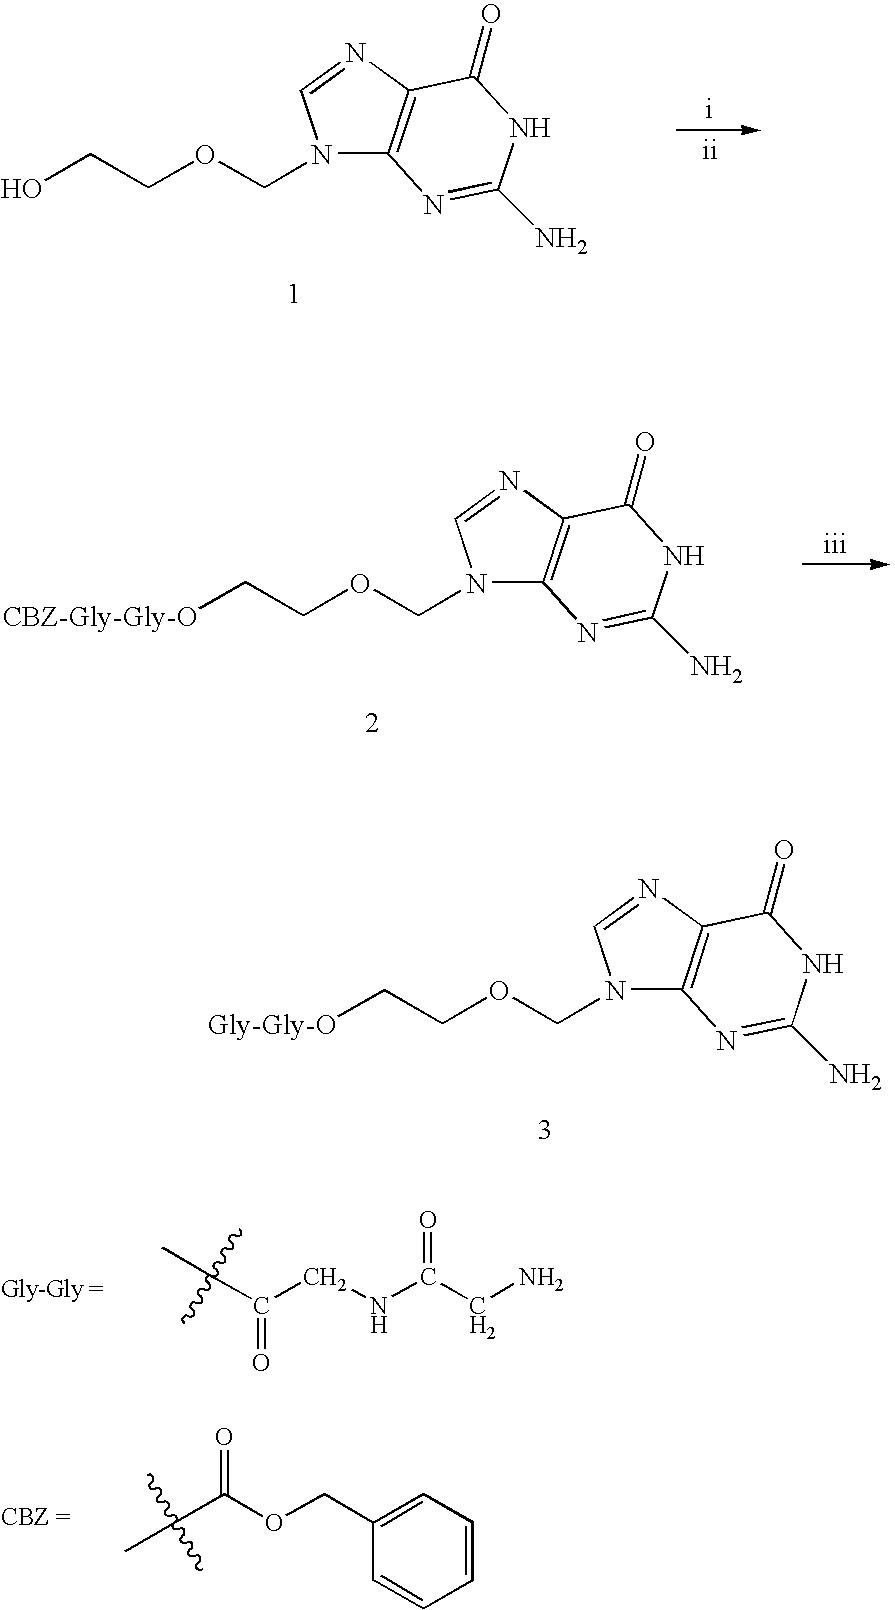 doxycycline hyclate what is it